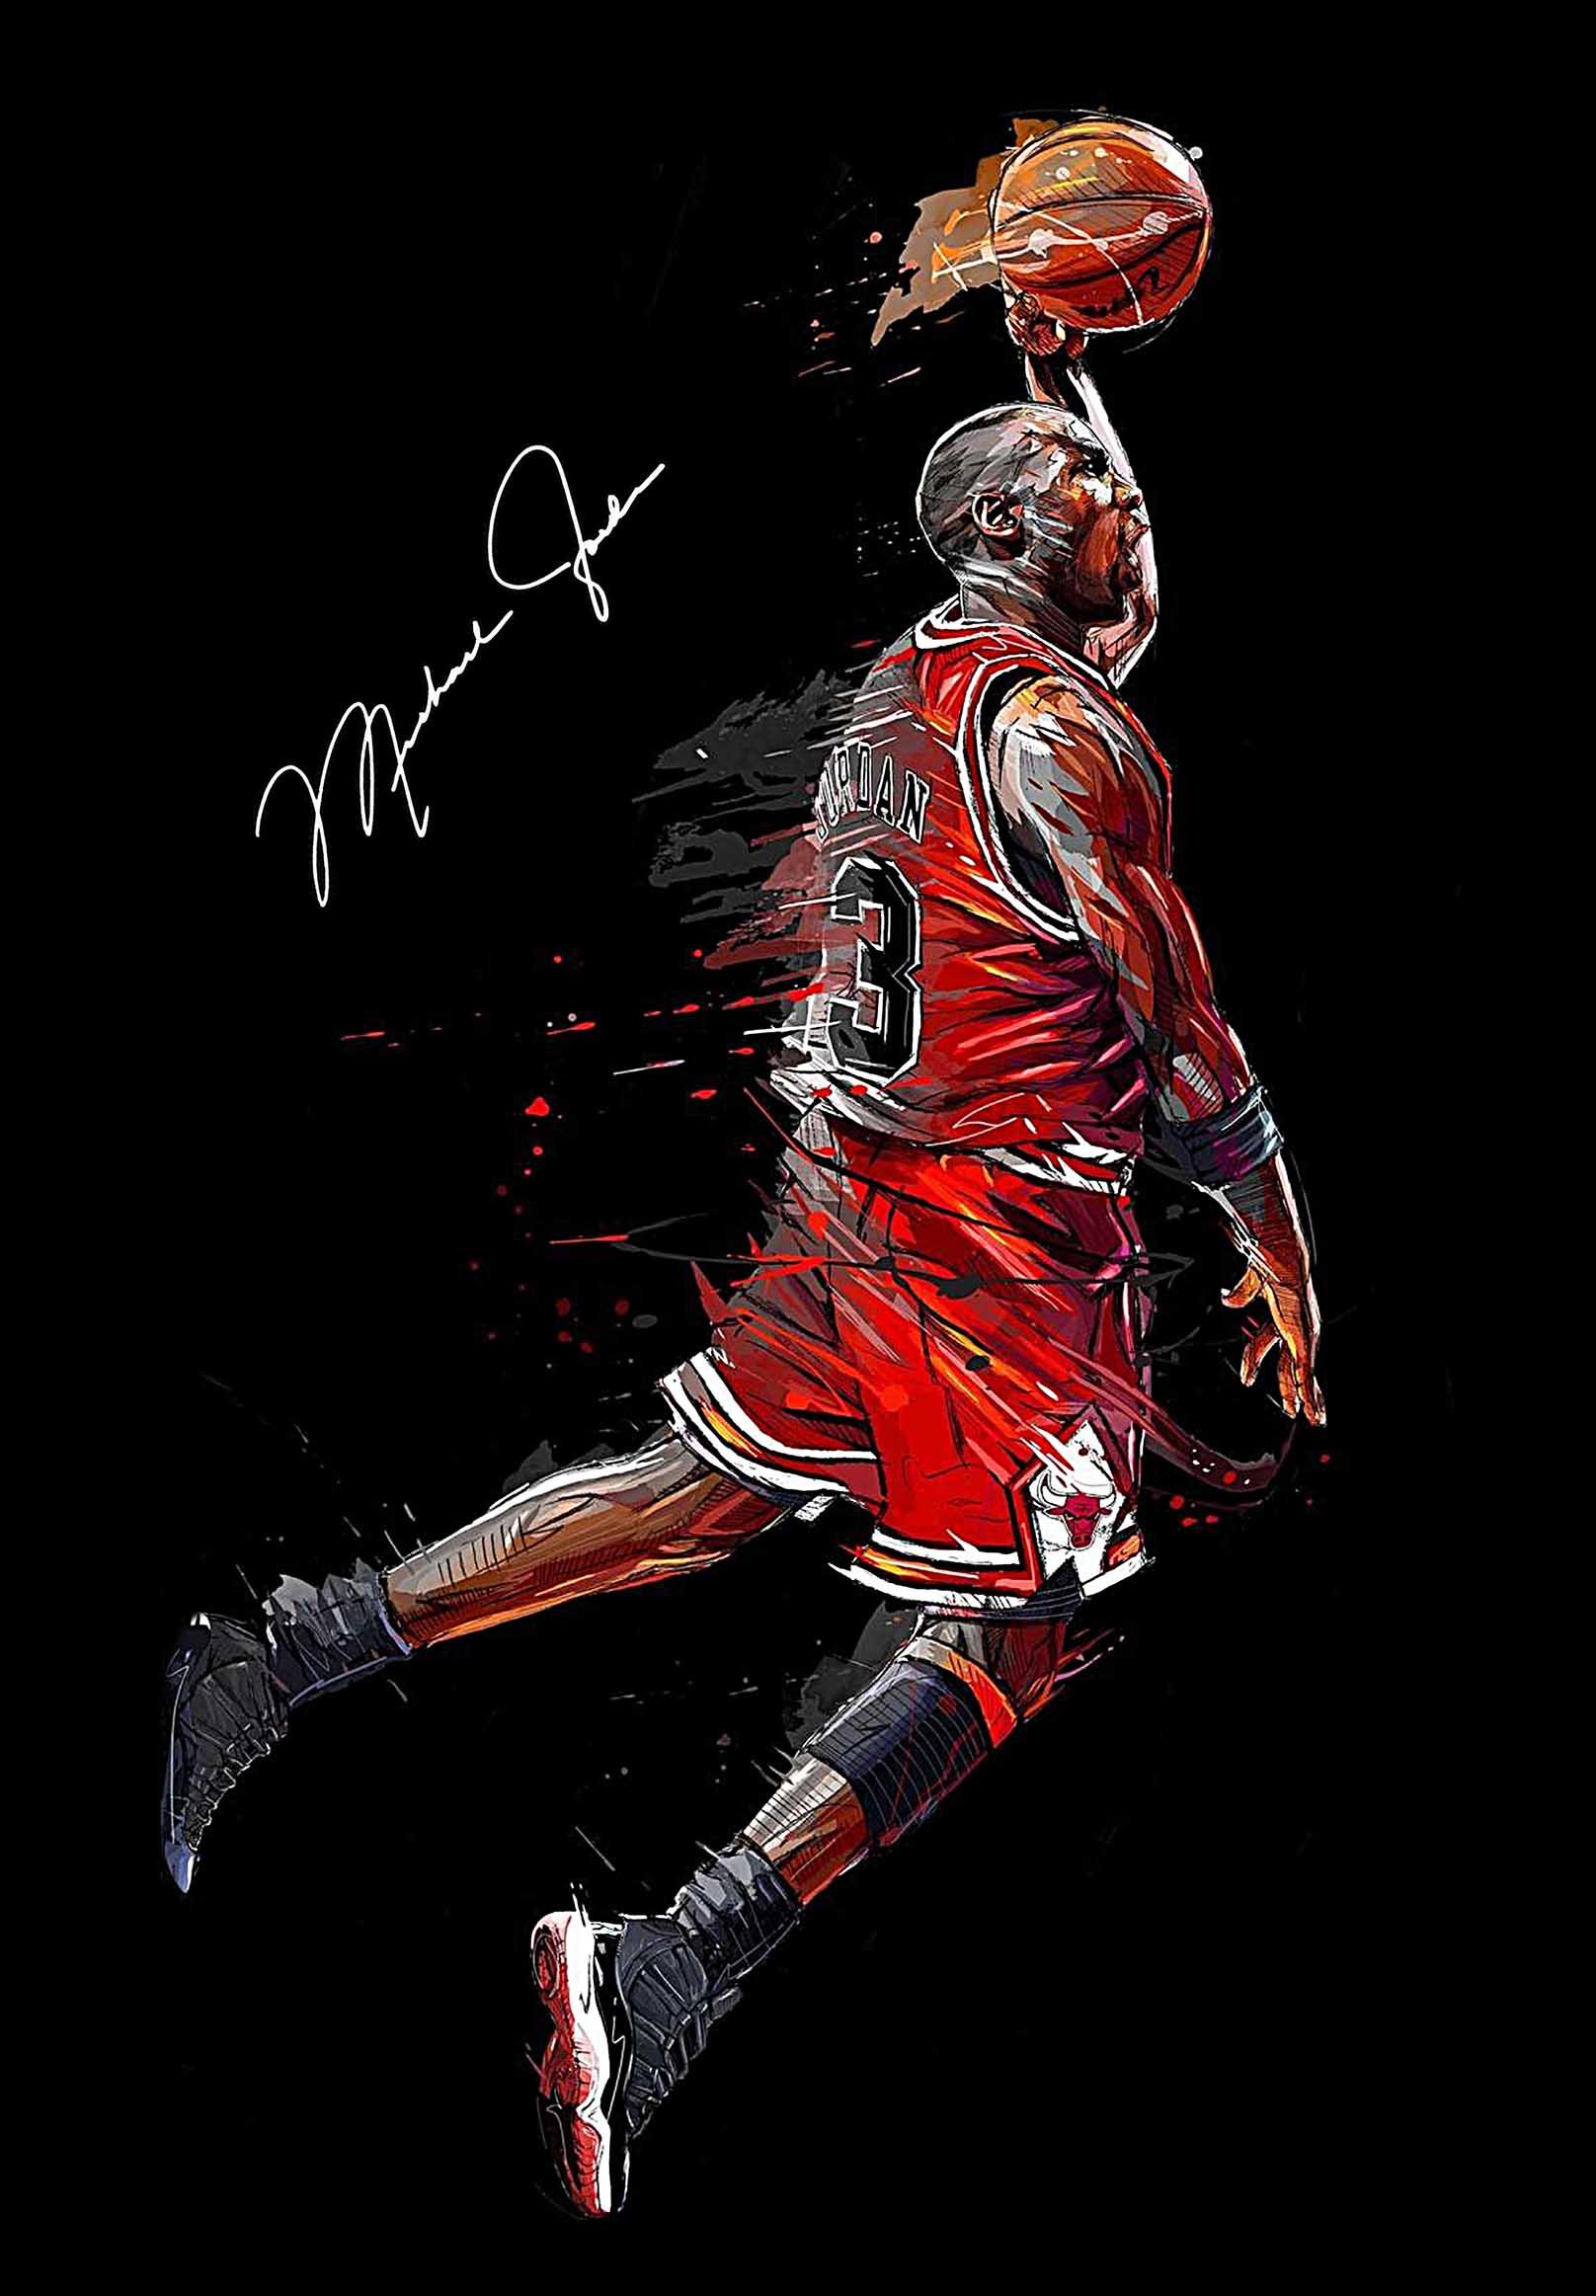 Michael Jordan Canvas Tablo (Nba-canvas-jordanmj6)